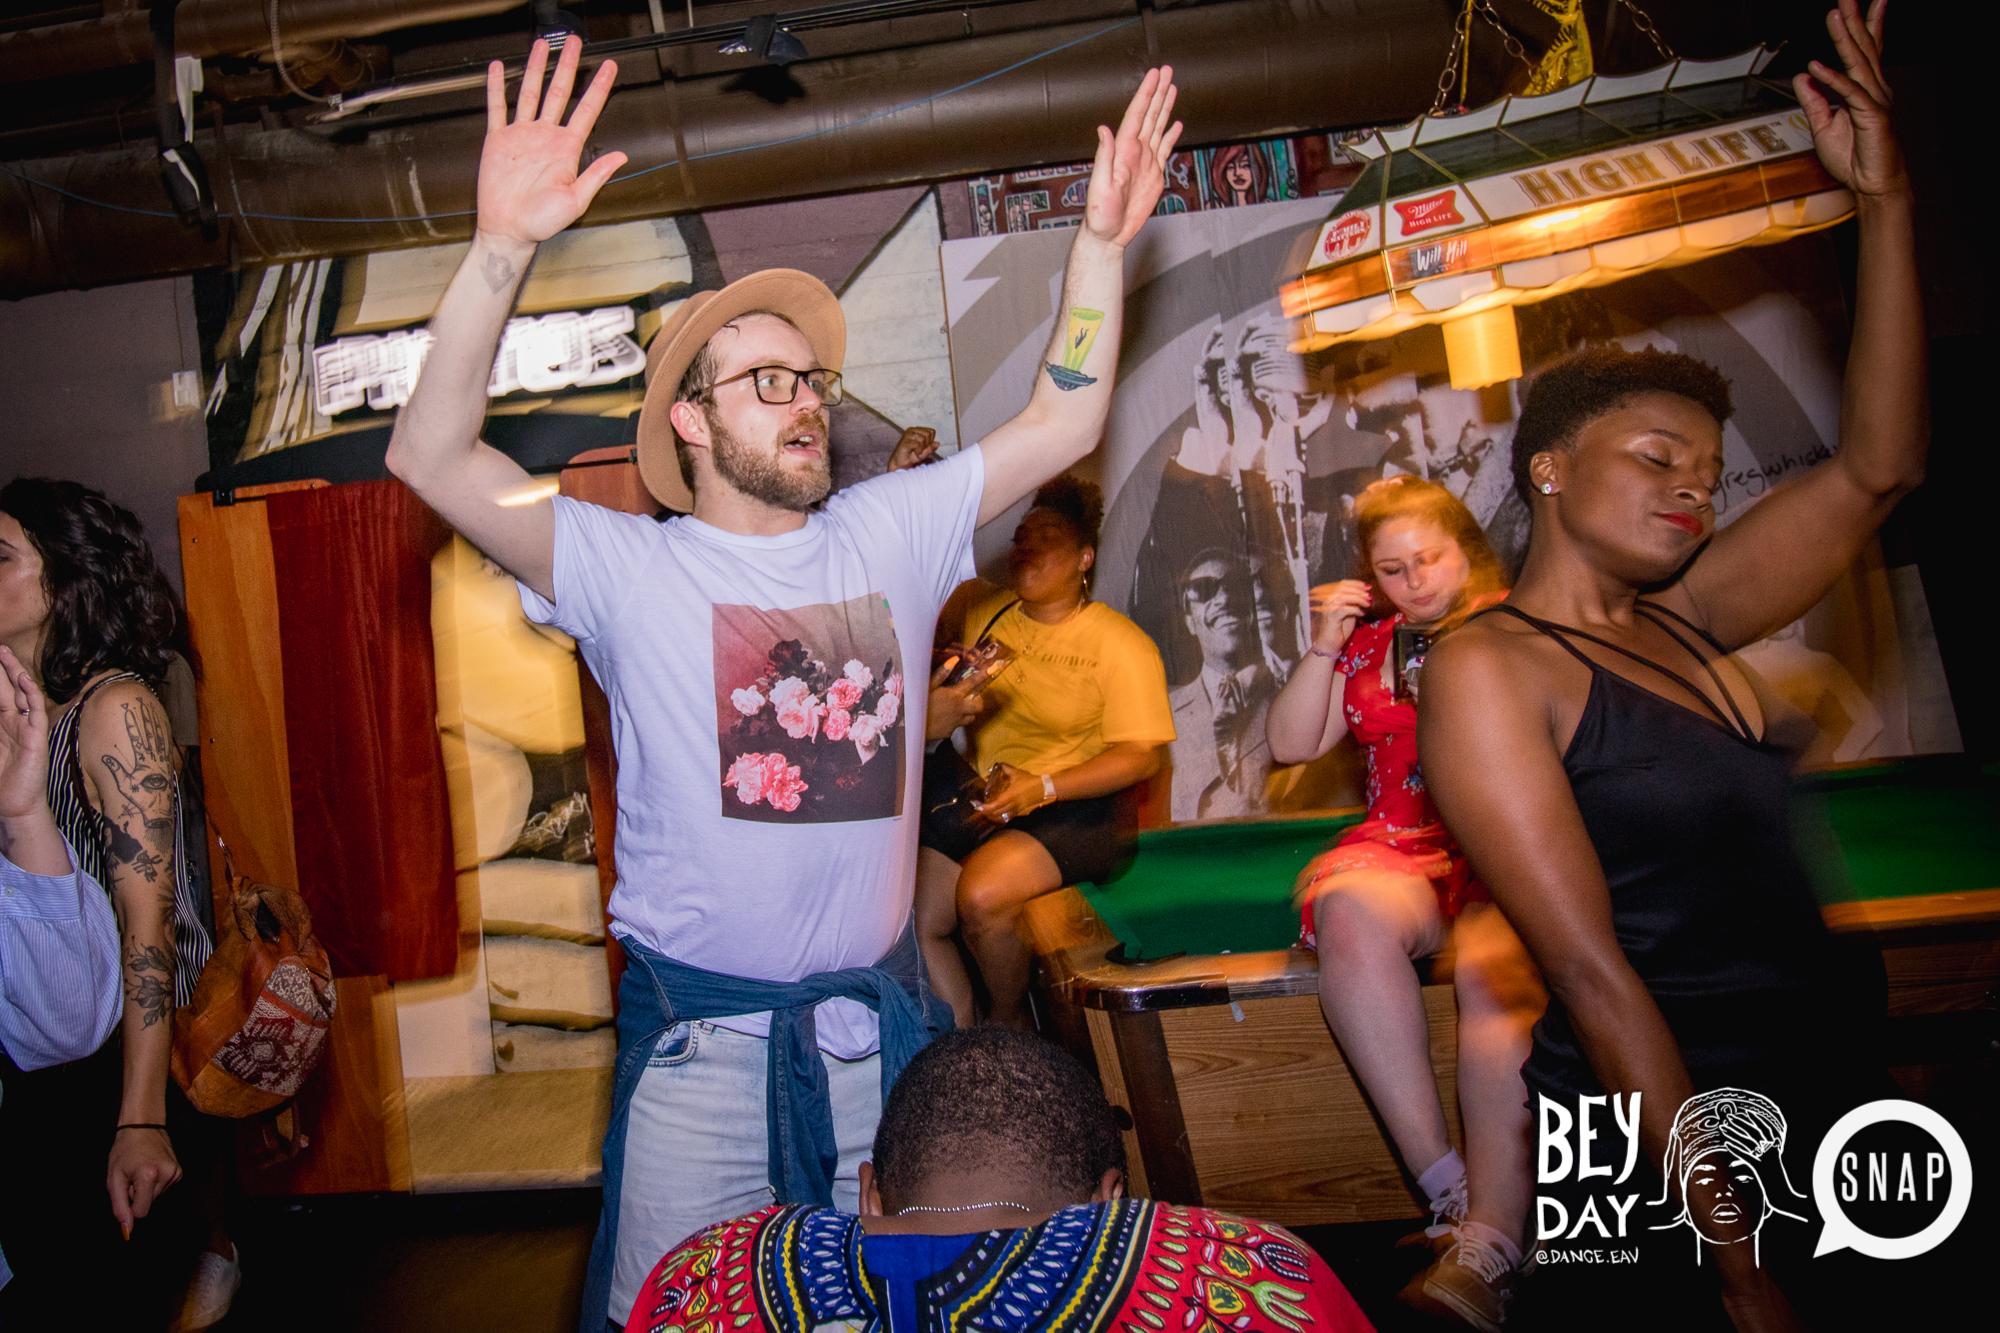 109Bey Day Grace Kelly The Basement Atlanta Oh Snap Kid.jpg